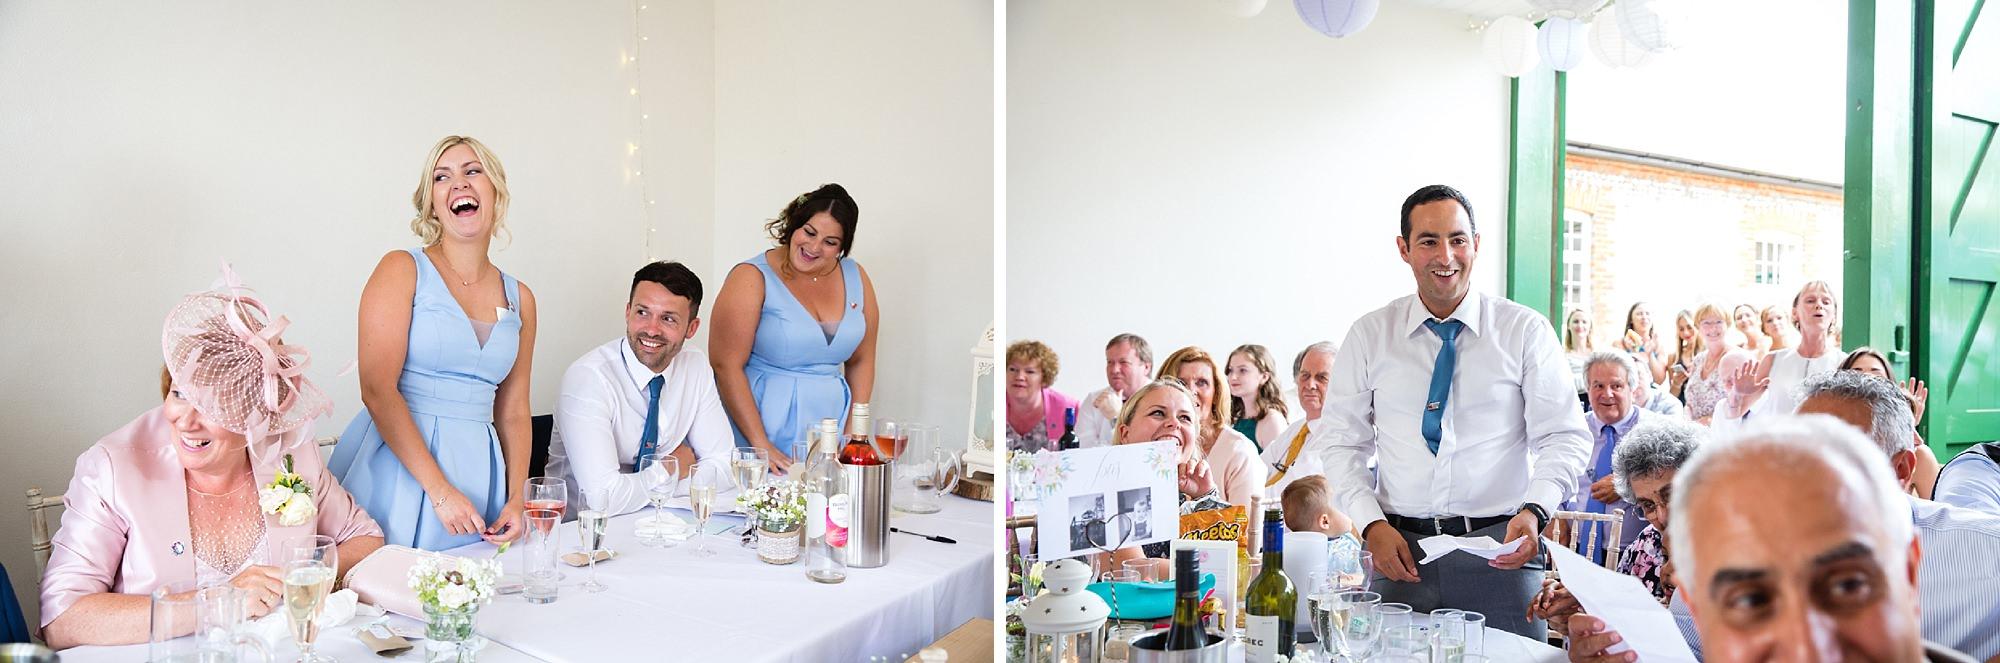 Bignor Park wedding photography bridal party singing